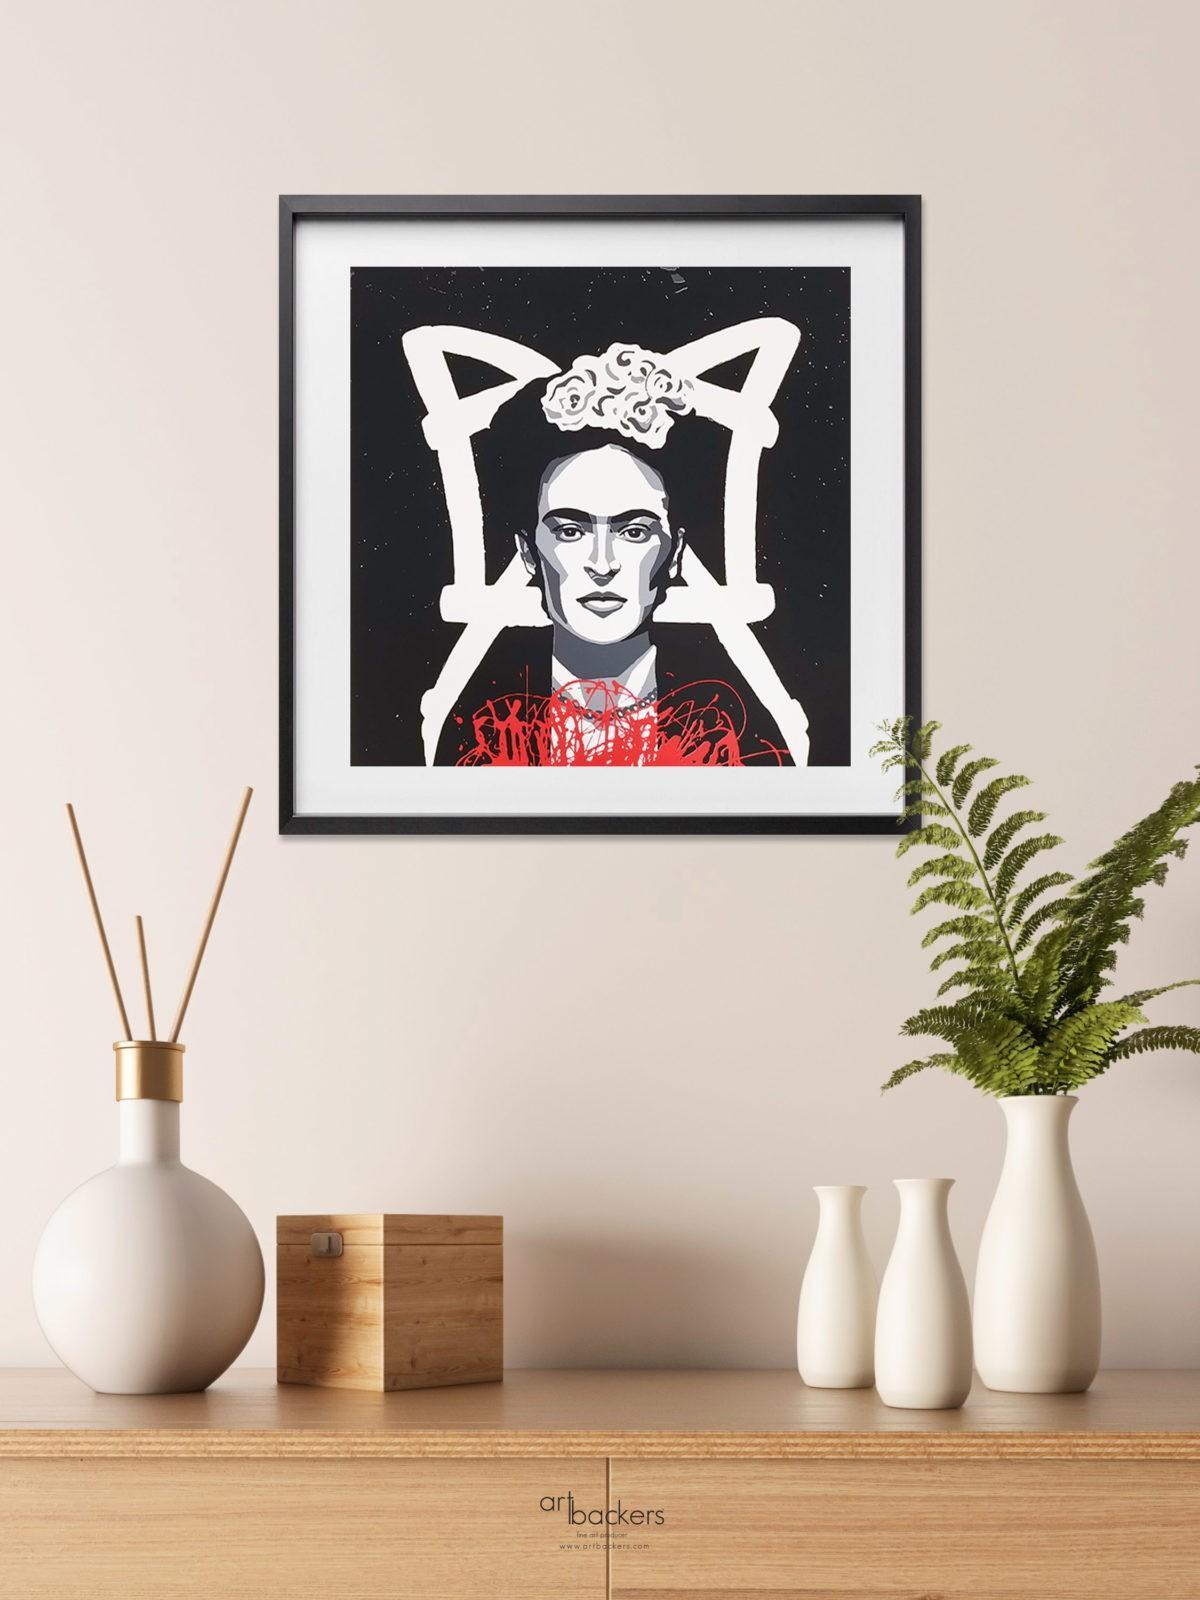 Lunart - Luna Berlusconi - ArtBackers